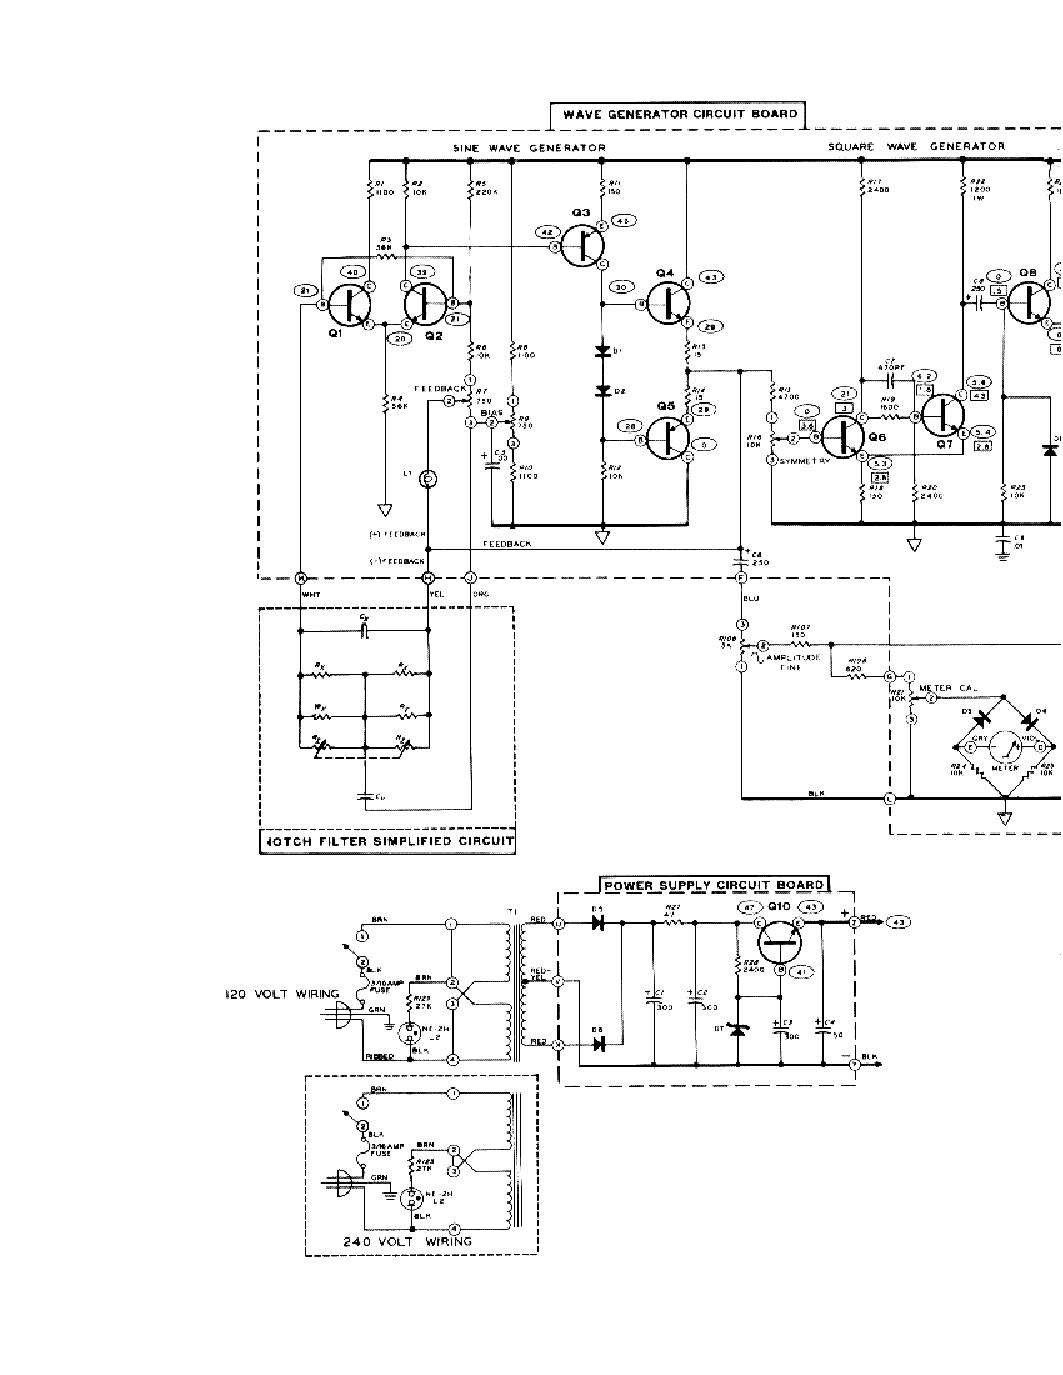 Heathkit Ig 18 Sine Square Audio Generator Sch Service Manual 120 Volt Wiring Diagram 1st Page